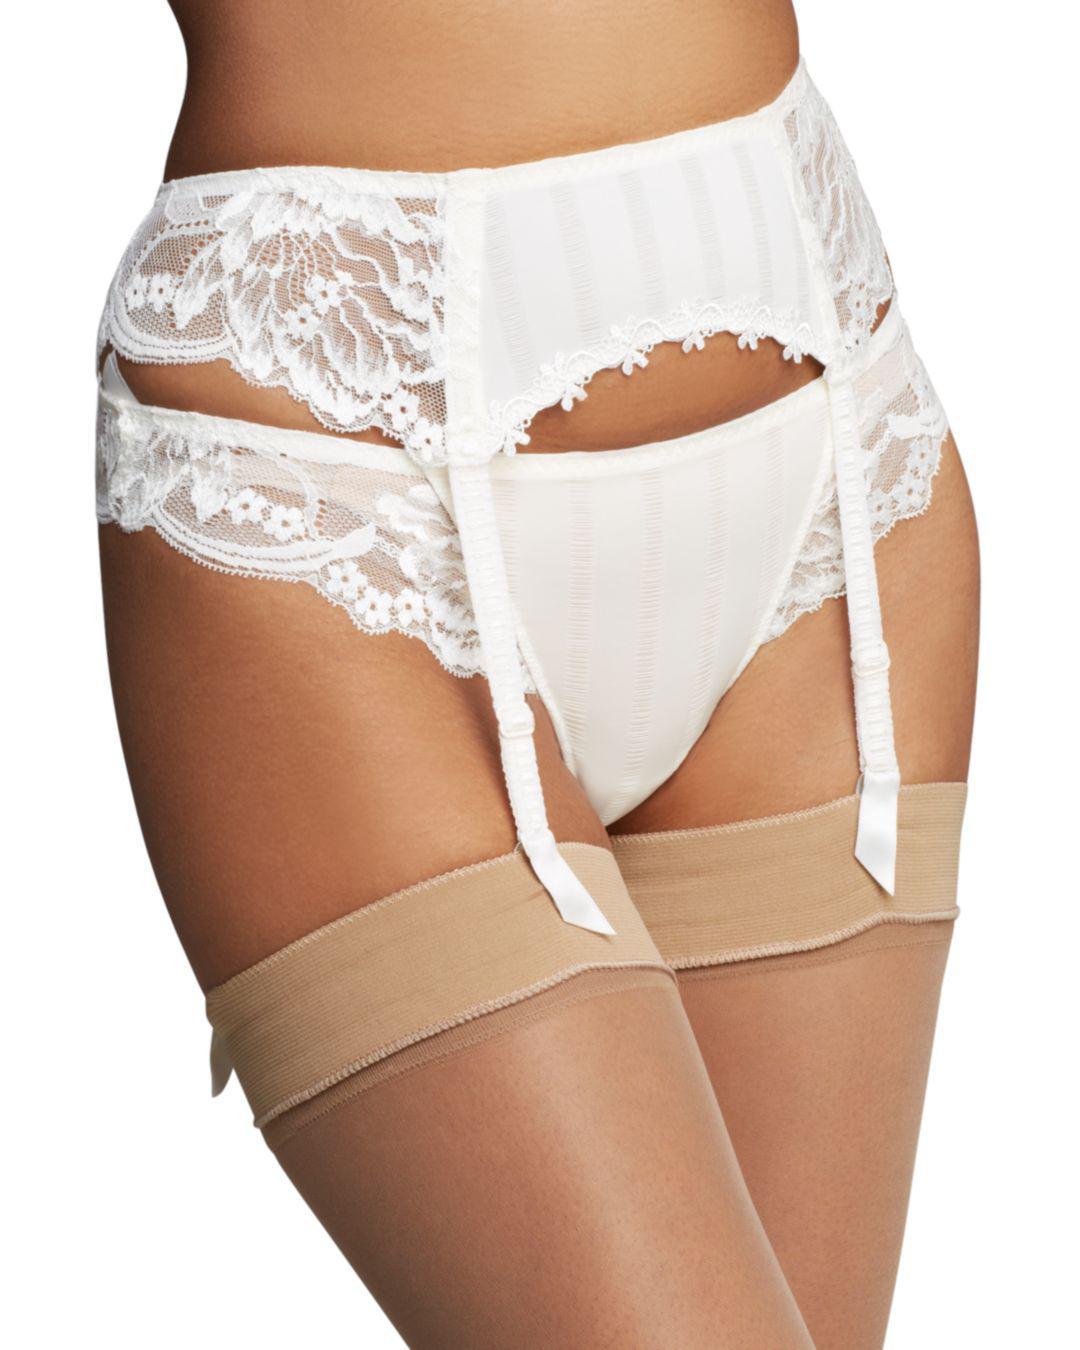 9f270c6f515 Simone Perele Simone Pérèle Amour Suspender Belt in White - Lyst